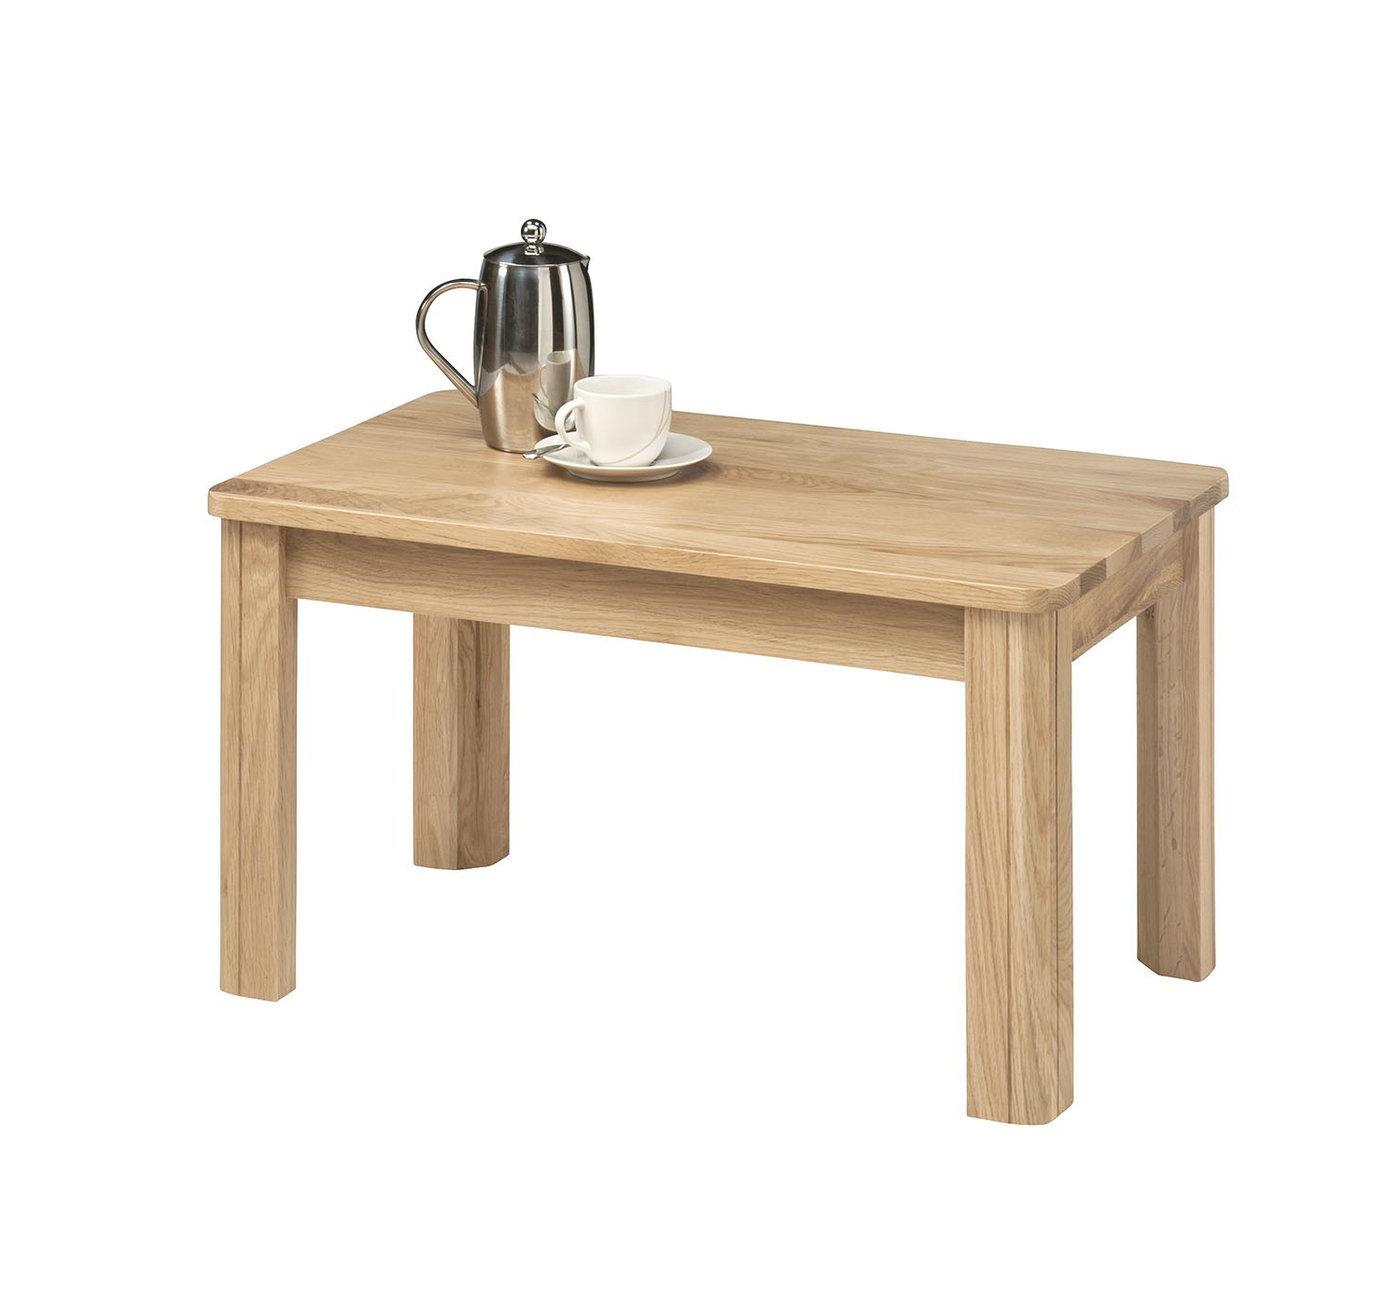 Small White Minimalist Oak Furniture Land Coffee Tables